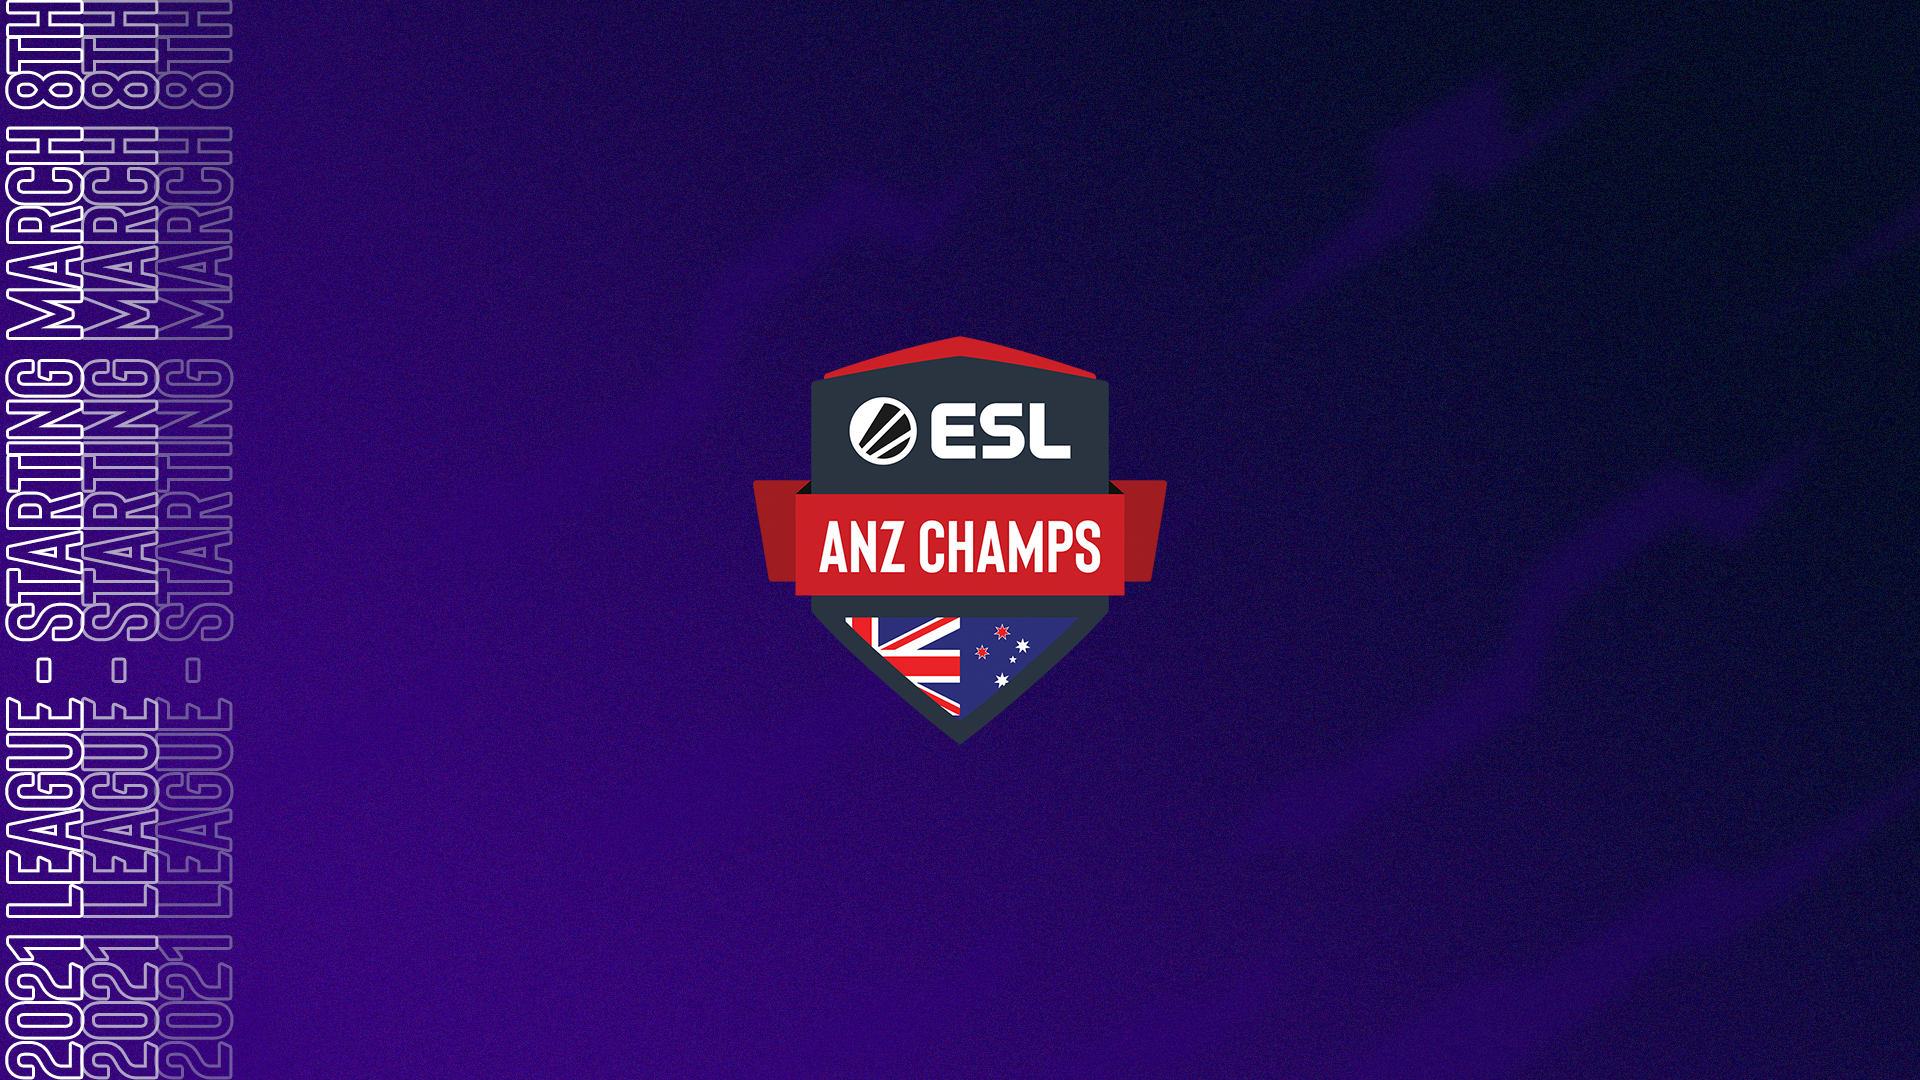 ESL ANZ Champs